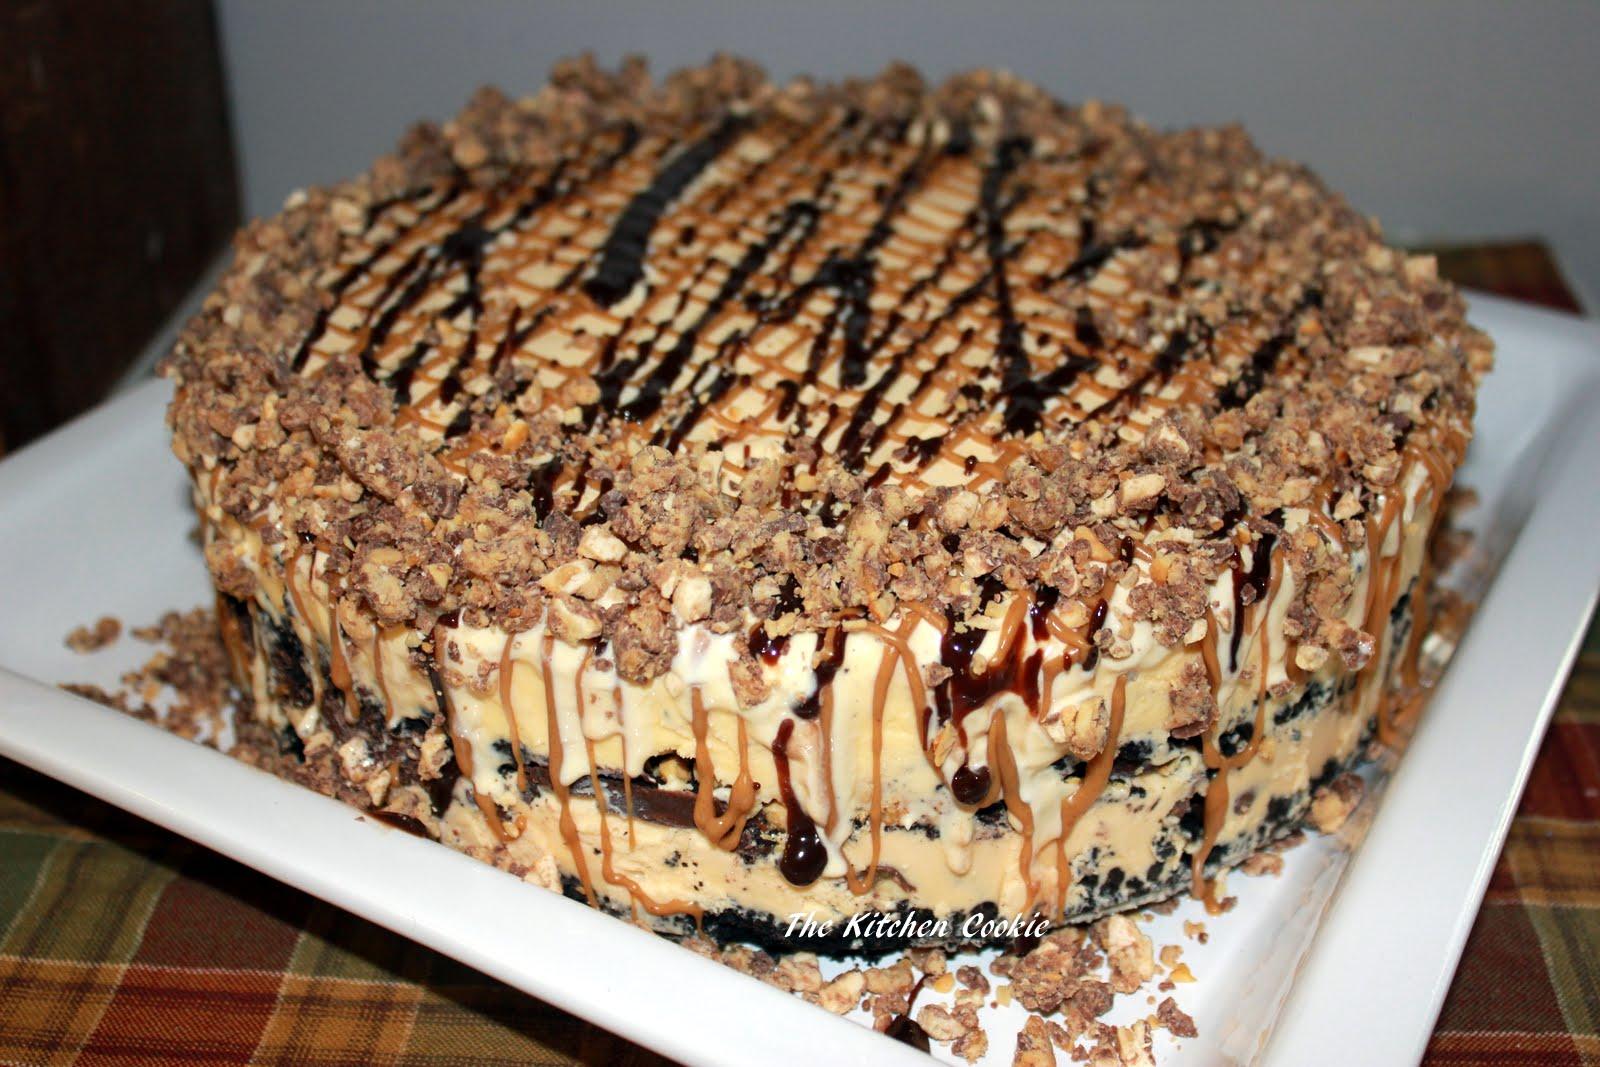 Cake Ice Cream Pizza : TheKitchenCookie: Peanut Butter and Snickers Ice Cream ...